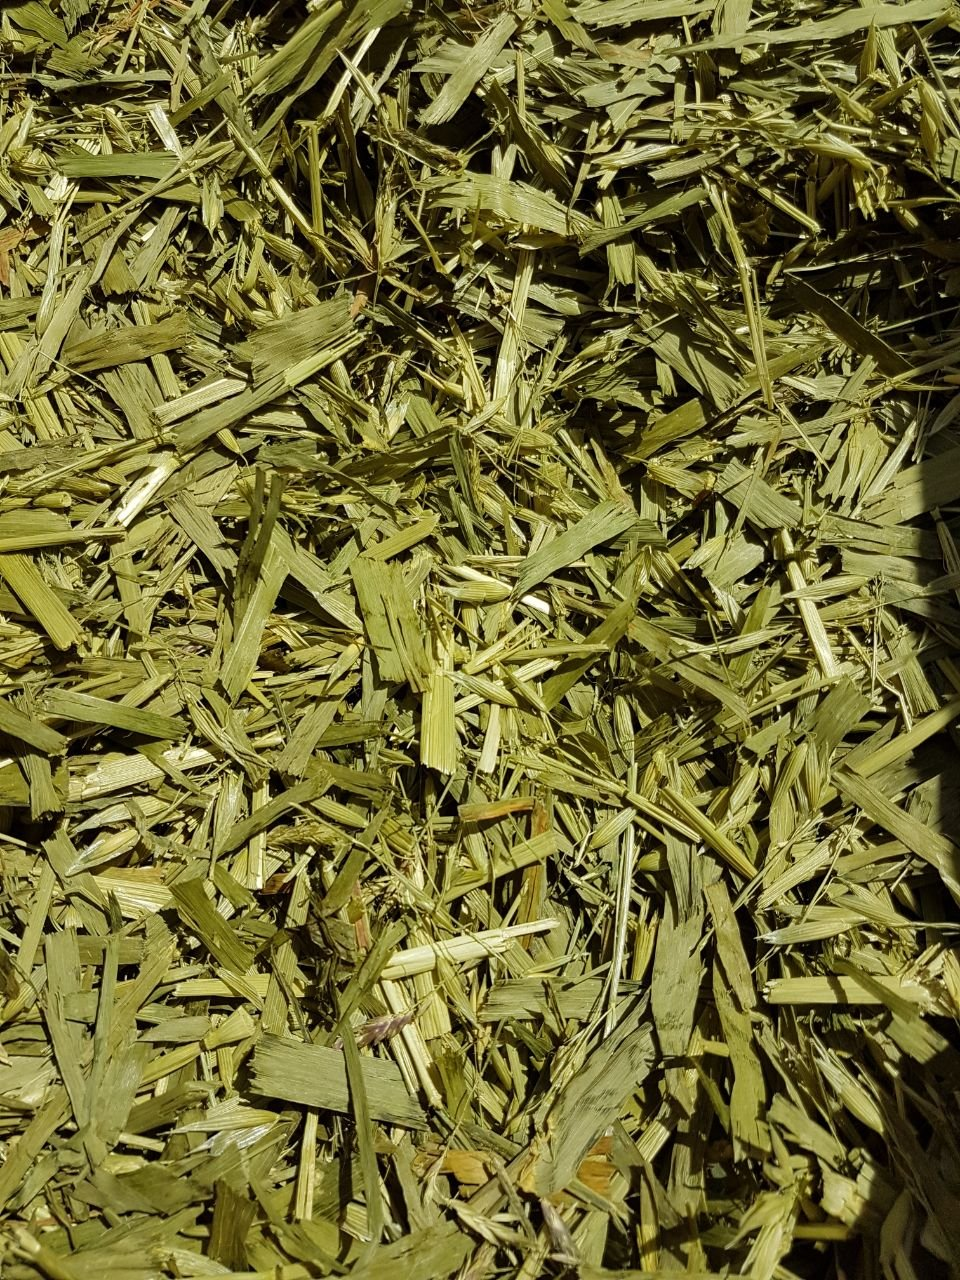 Vert Avoine Vert Avoine Bio Avoine Avoine verte herbe Terra Pura 2kg Top Qualité Terra-Pura-Tiernahrung e.K.